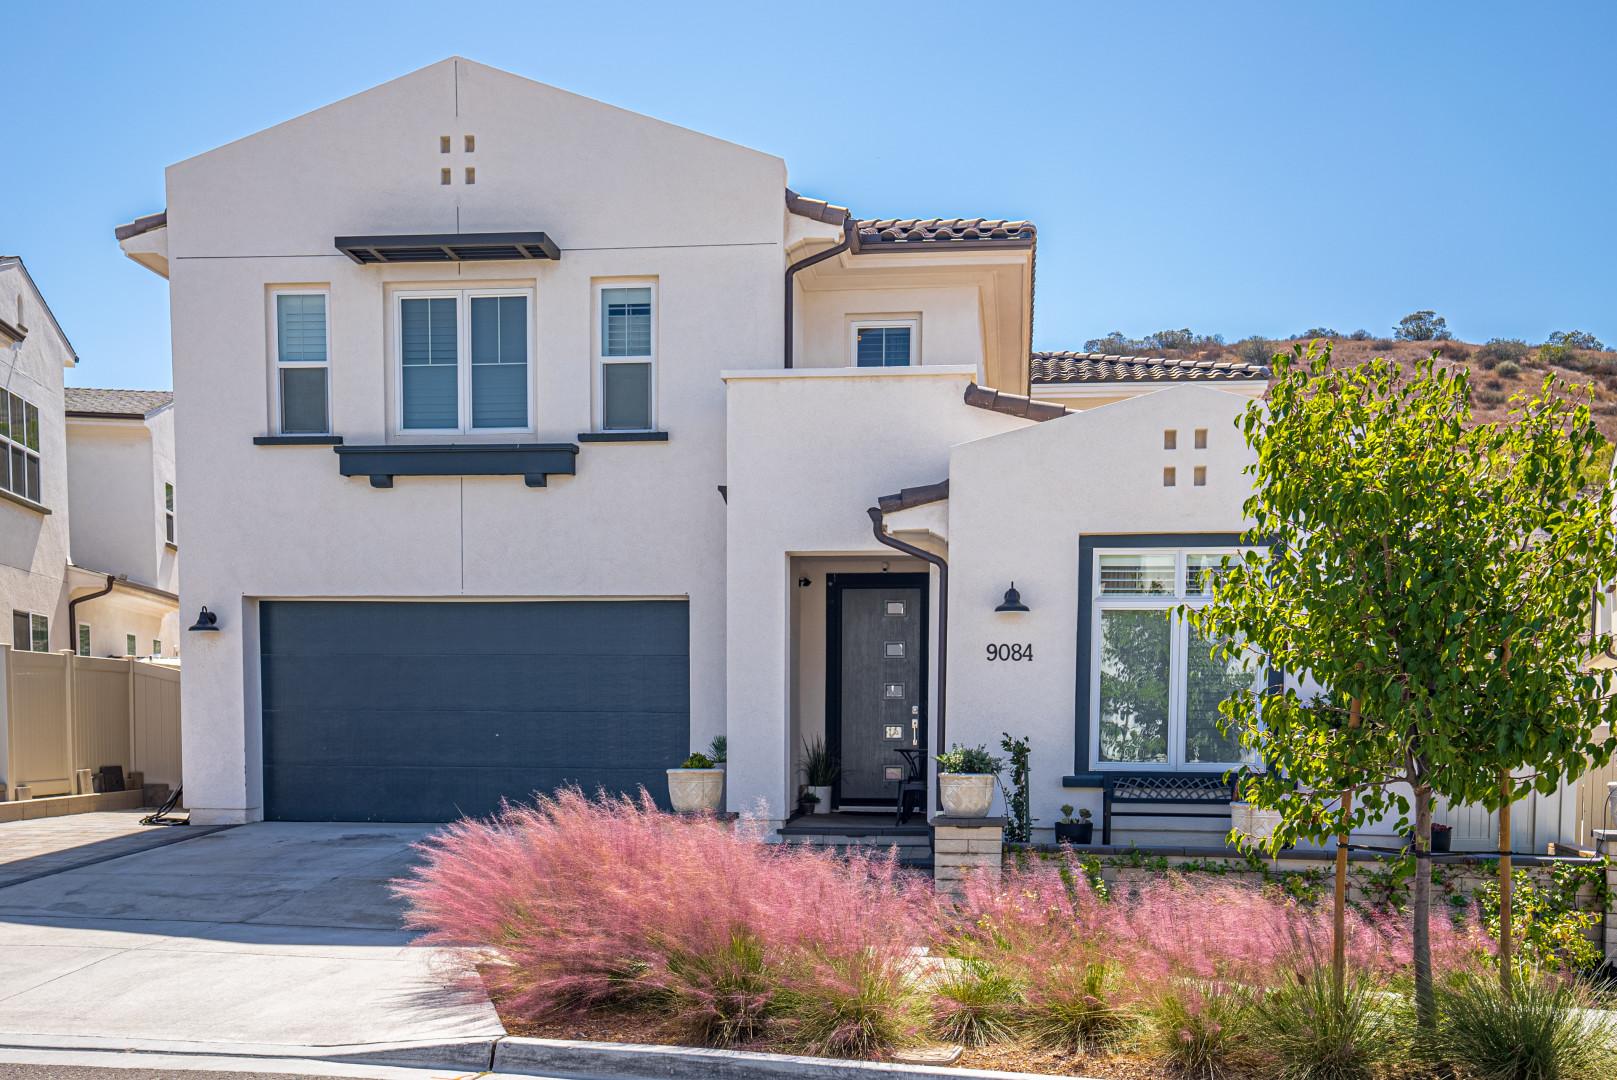 9084 W Bluff Pl, Santee, California 92071